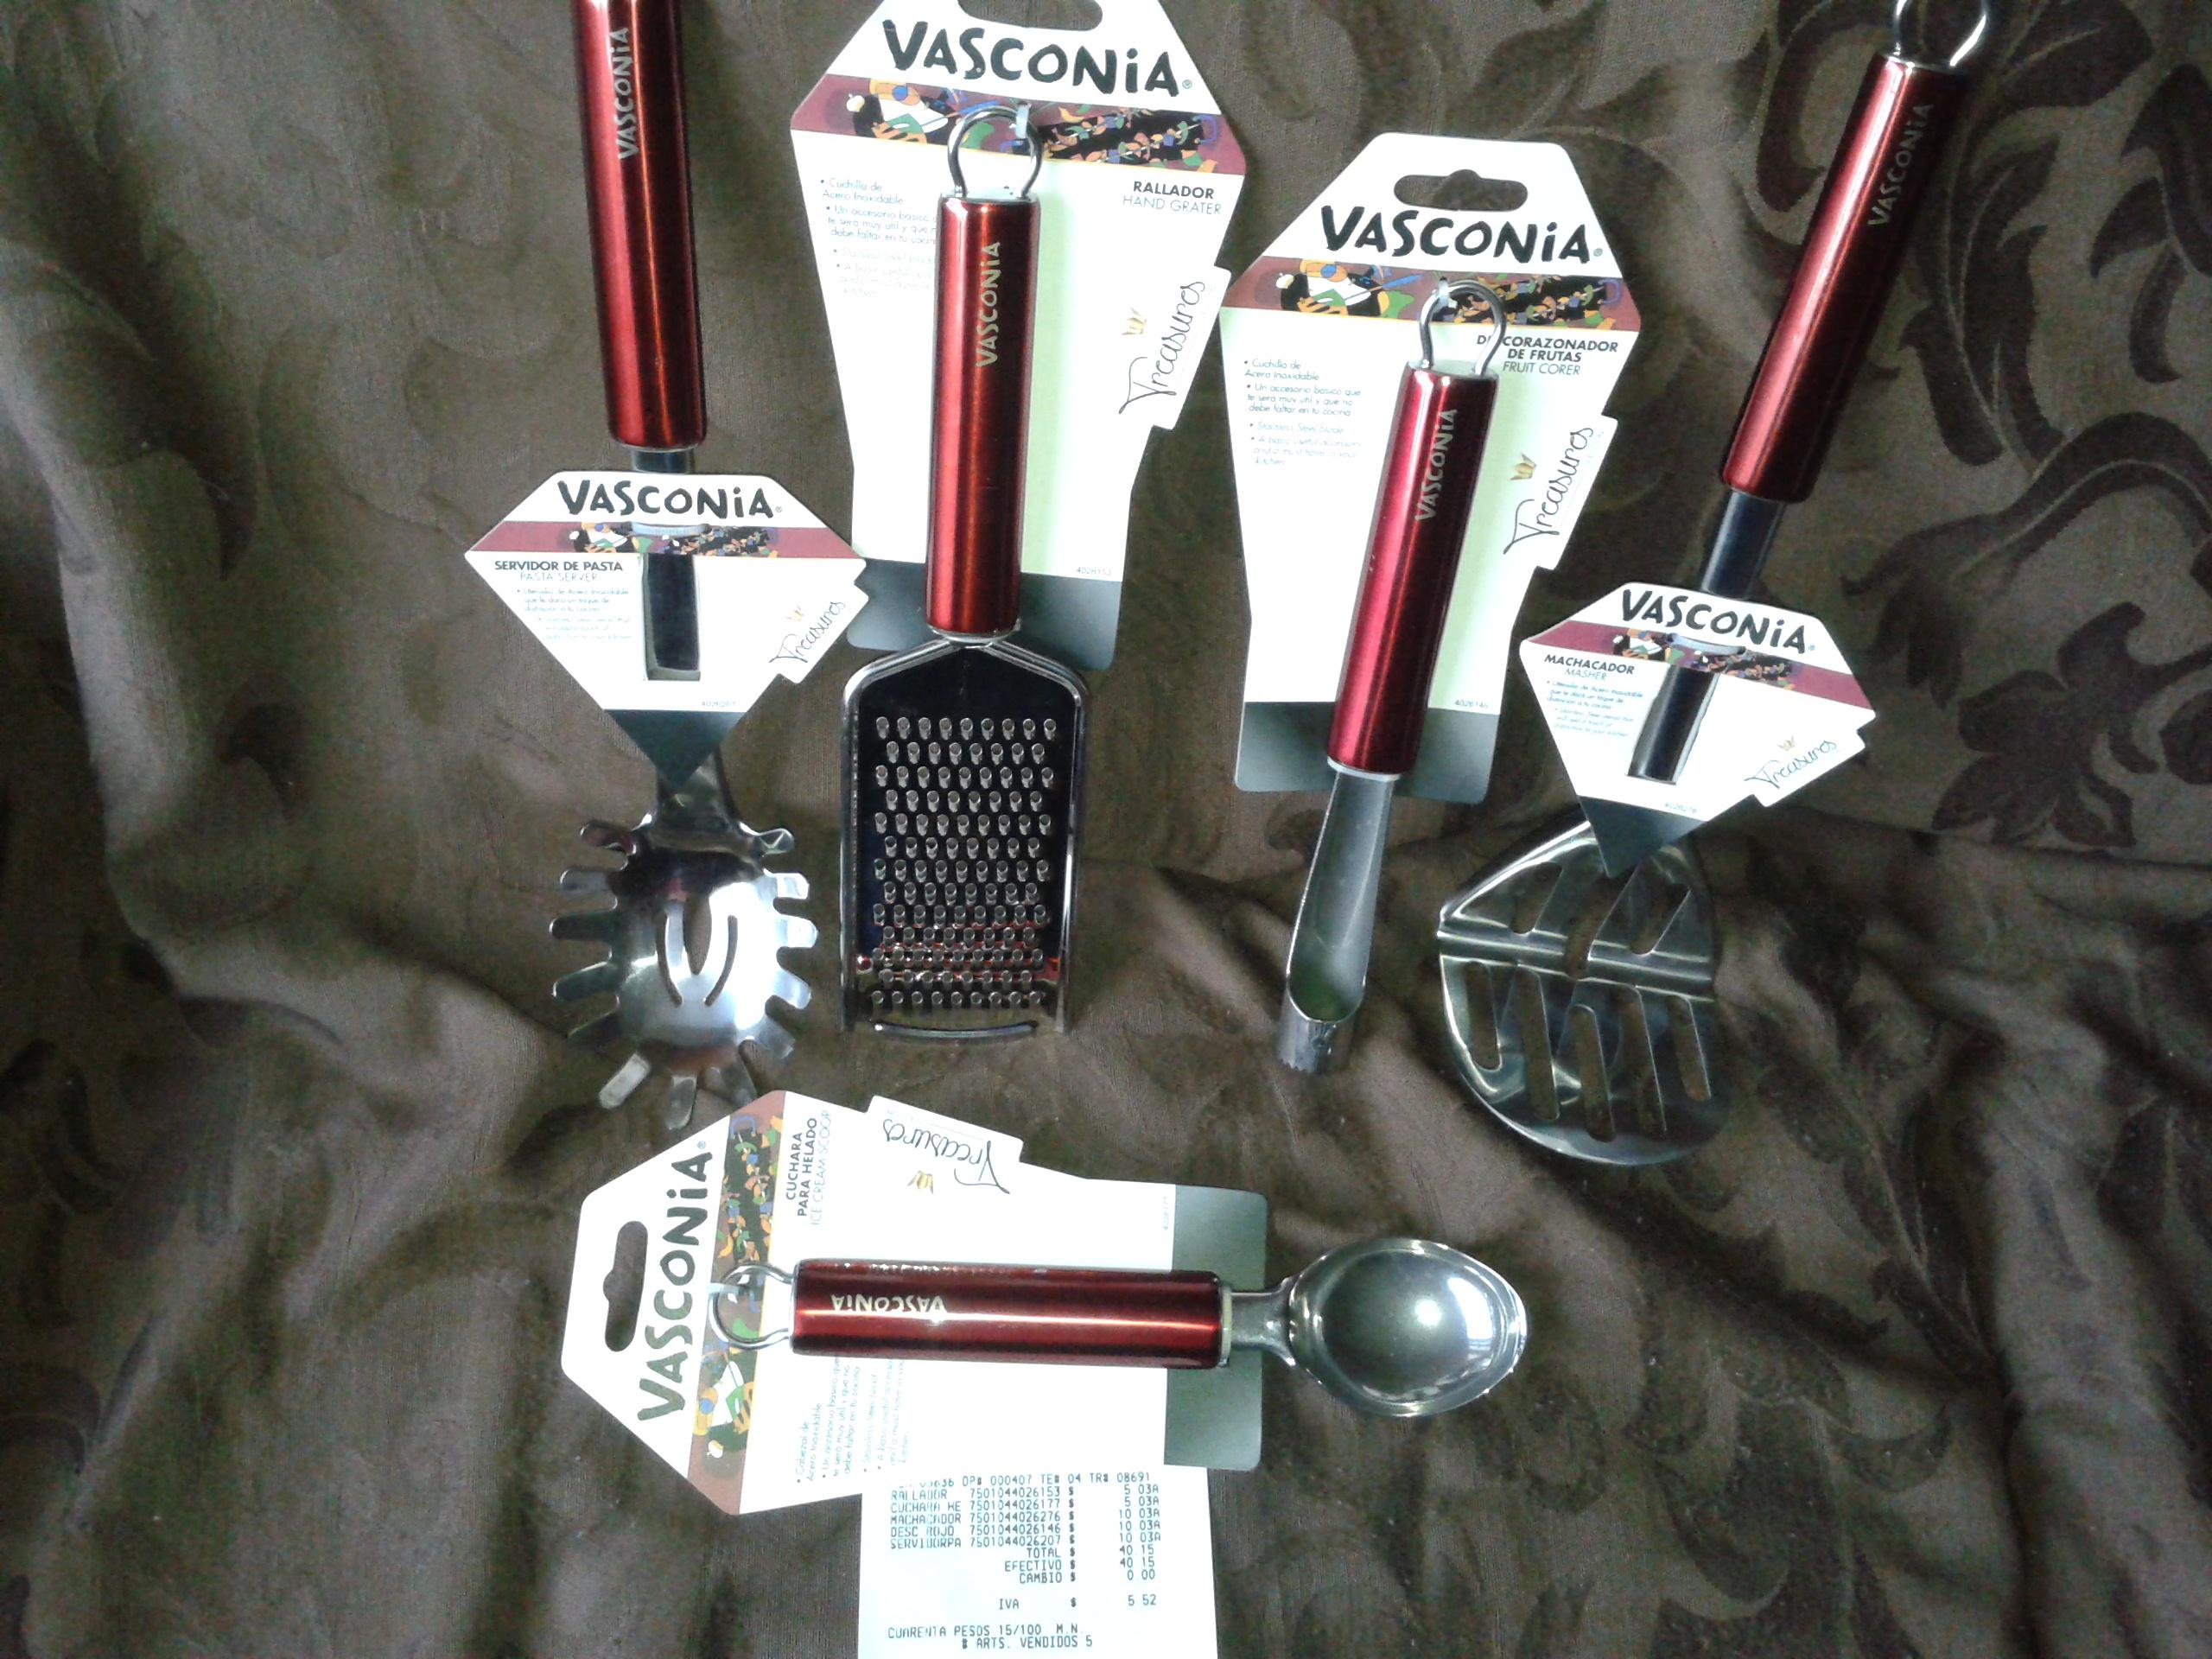 Superama: utensilios de cocina Vasconia a $5.03 y $10.03